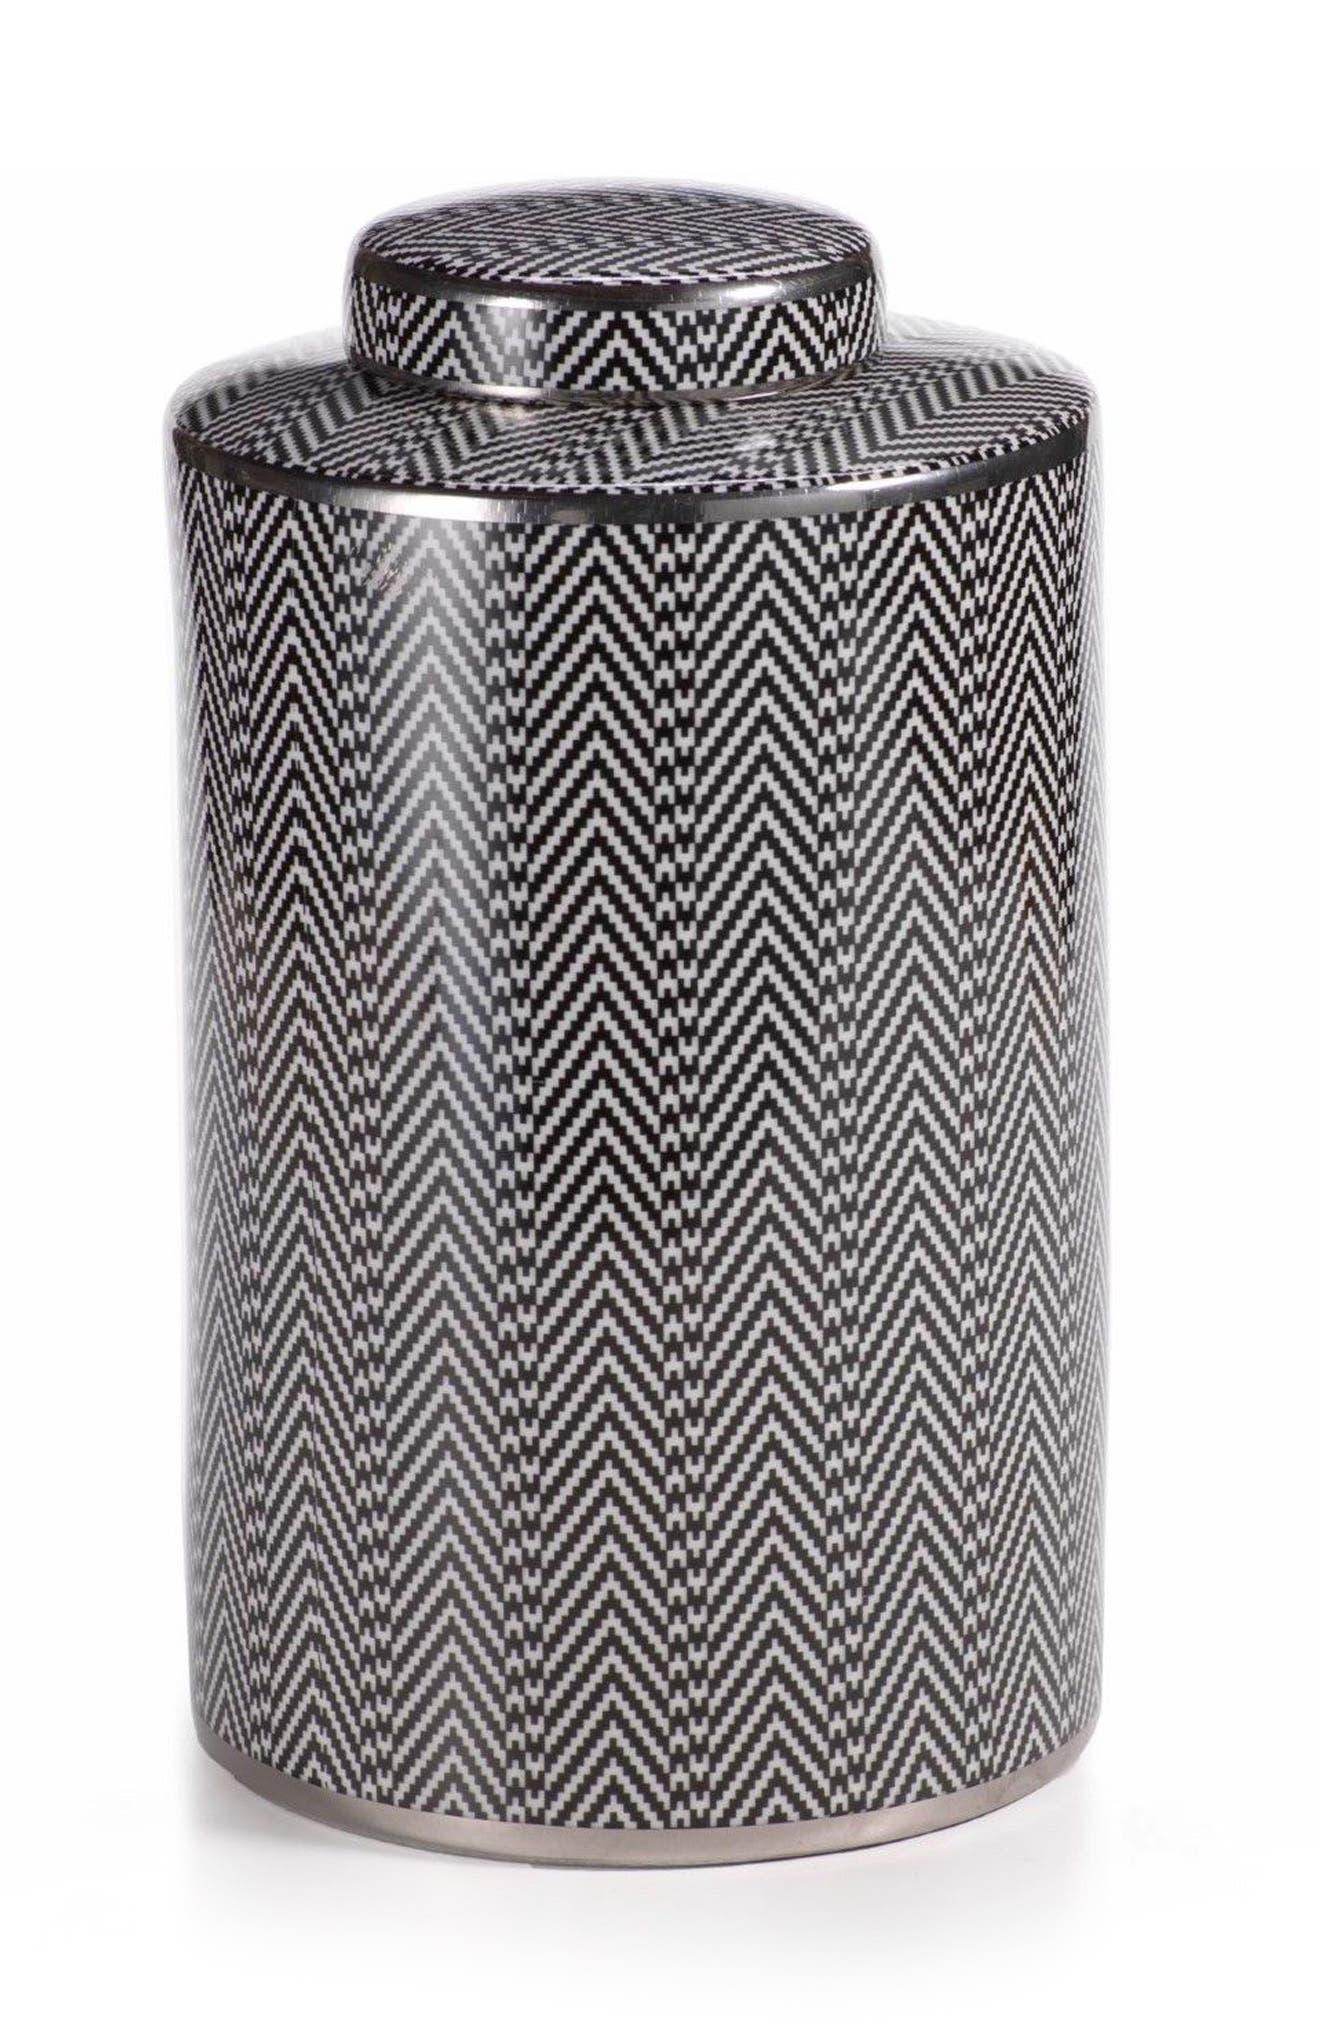 Large Matiss Decorative Jar,                             Main thumbnail 1, color,                             Black/ White